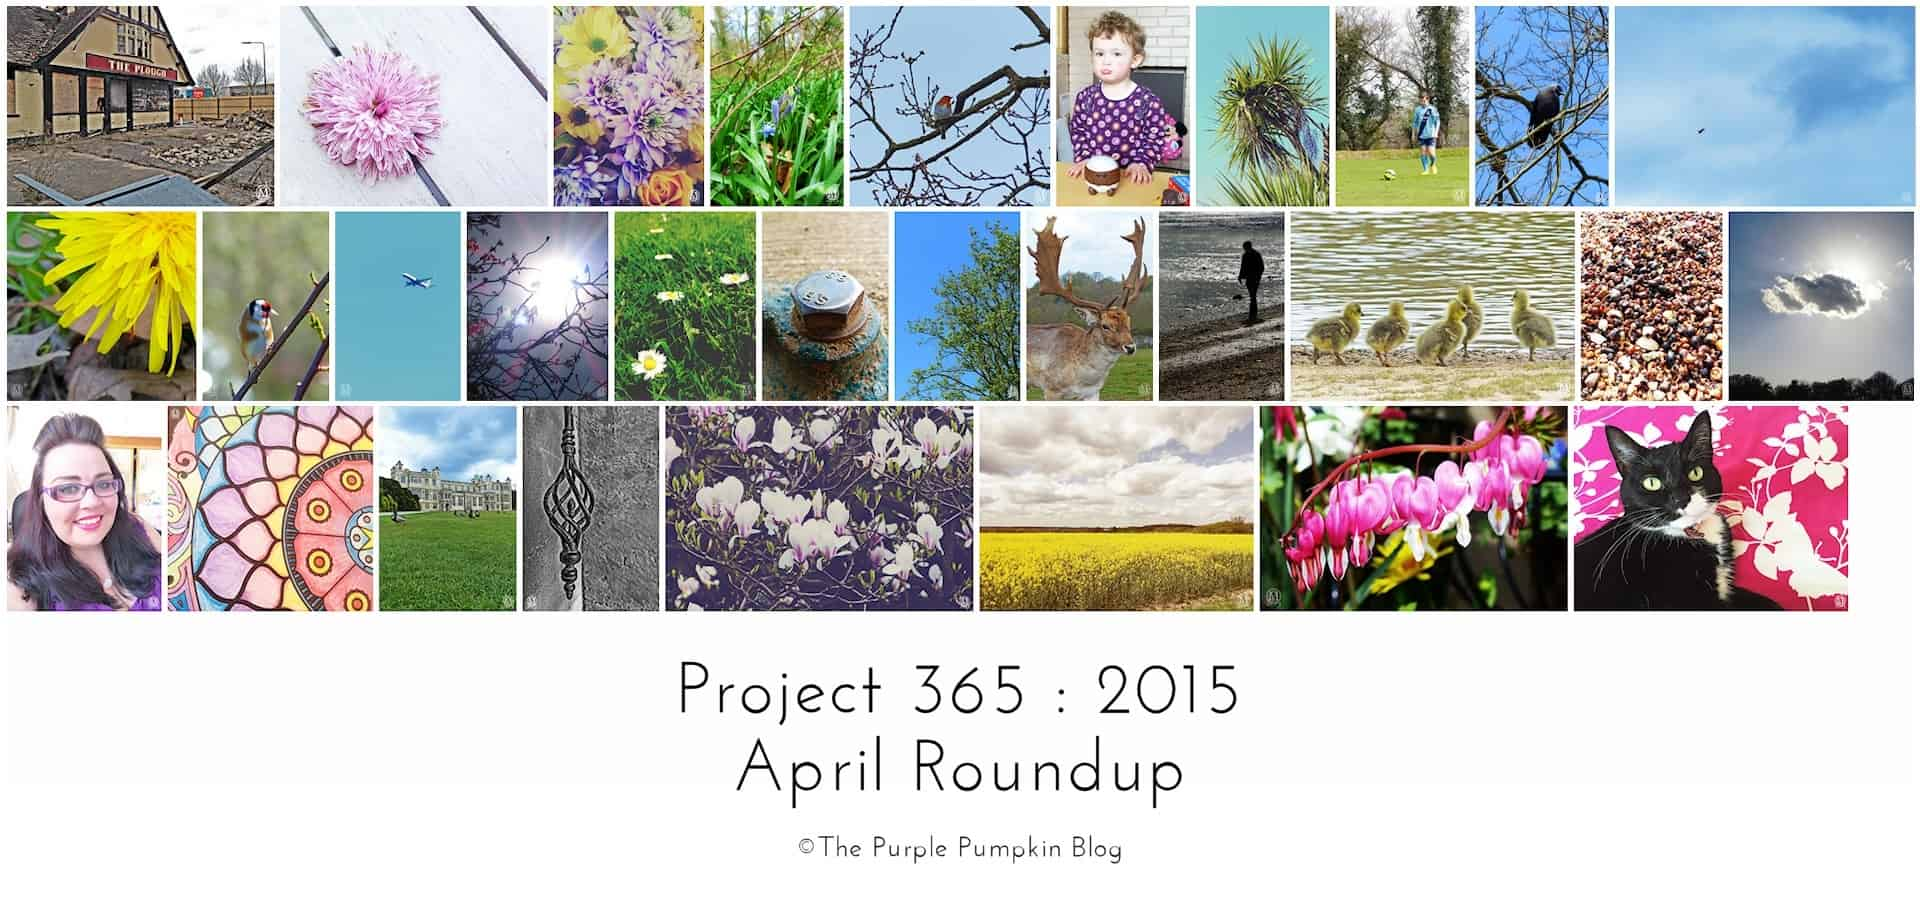 April Roundup Project 365 2015